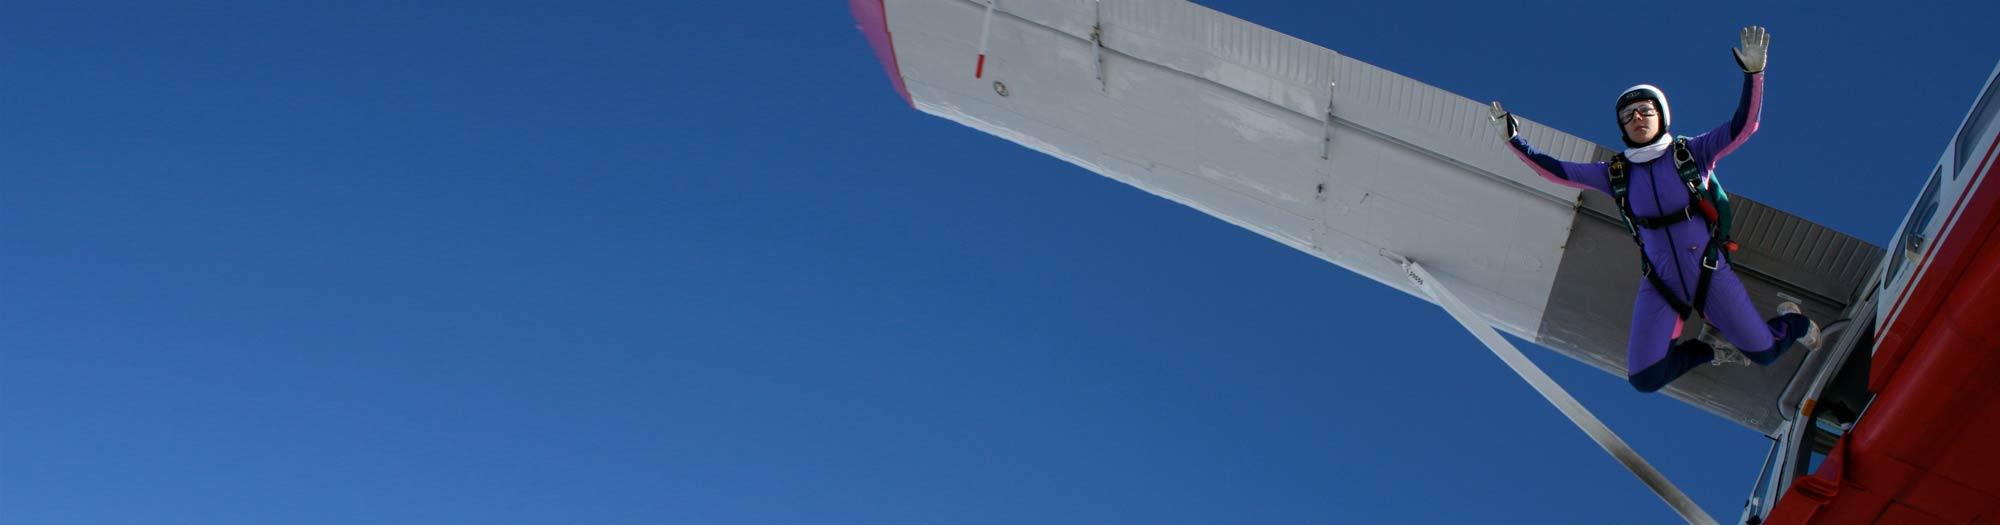 Fallschirmspringer beim Absprung